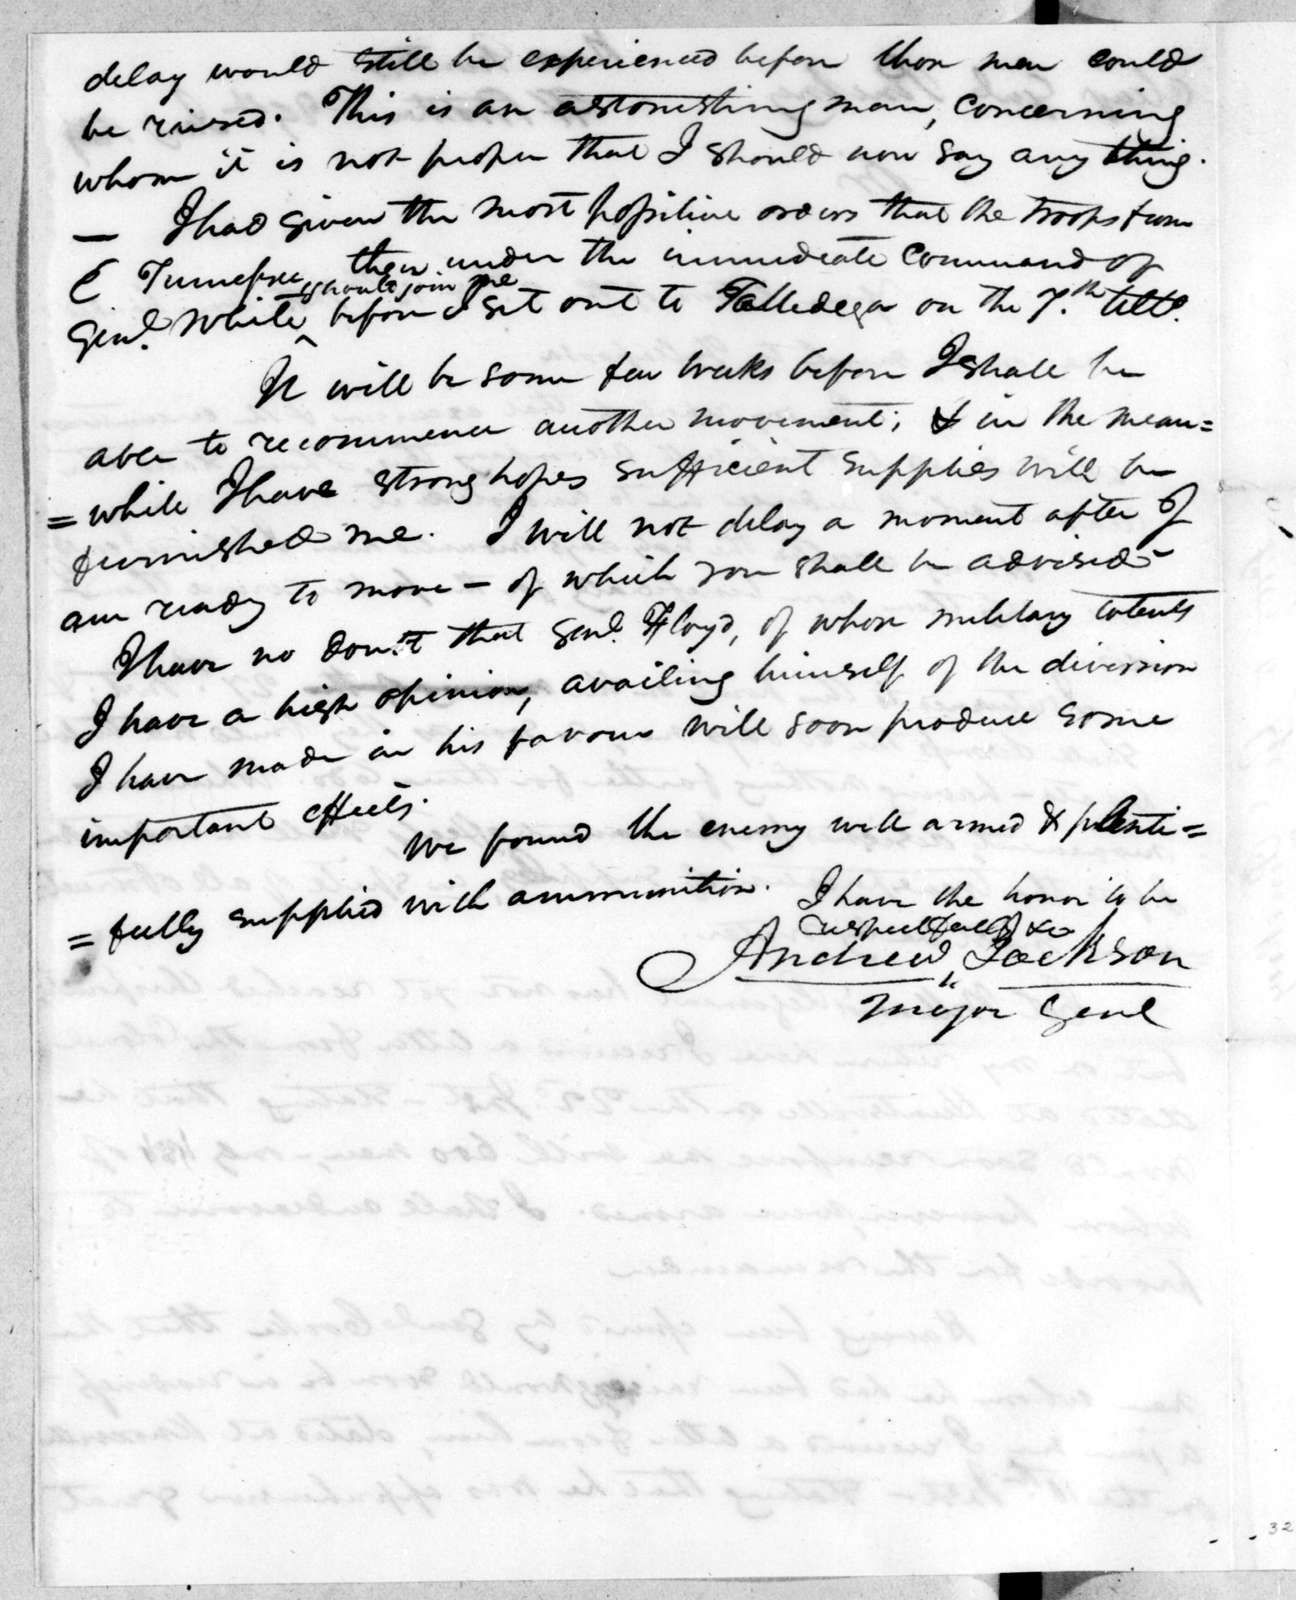 Andrew Jackson to Thomas Pinckney, January 29, 1814